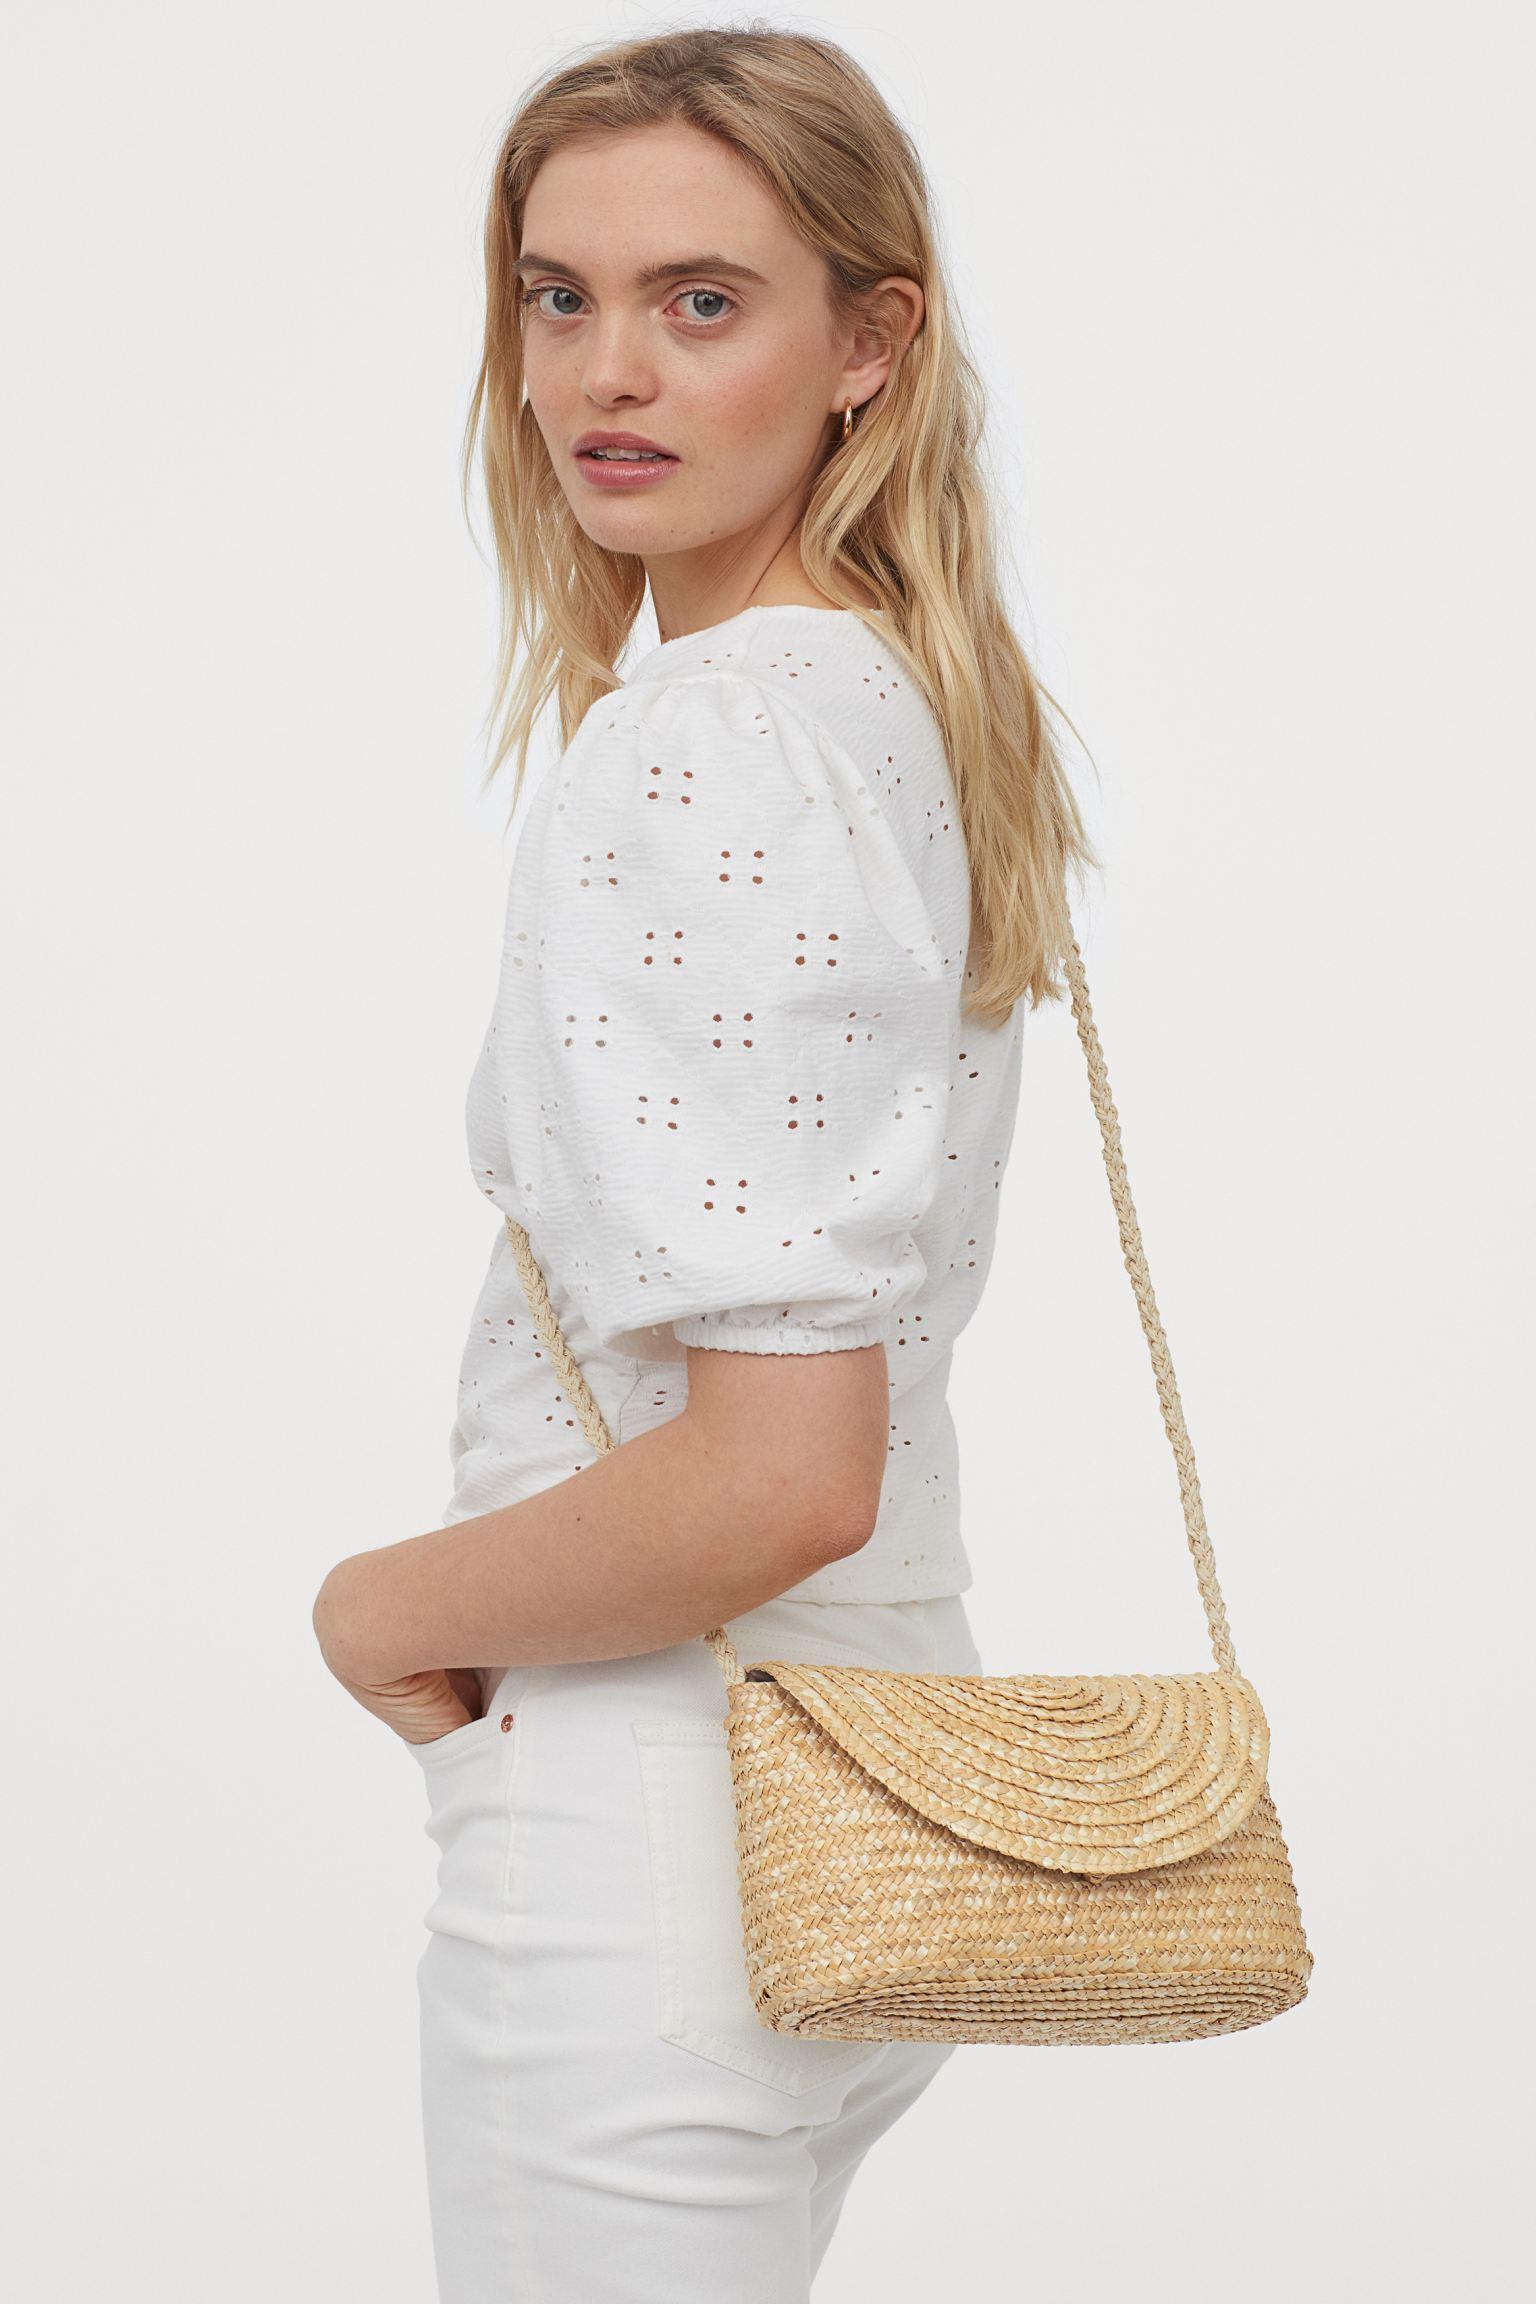 Отзыв на Kleine Strohhandtasche из Интернет-Магазина H&M